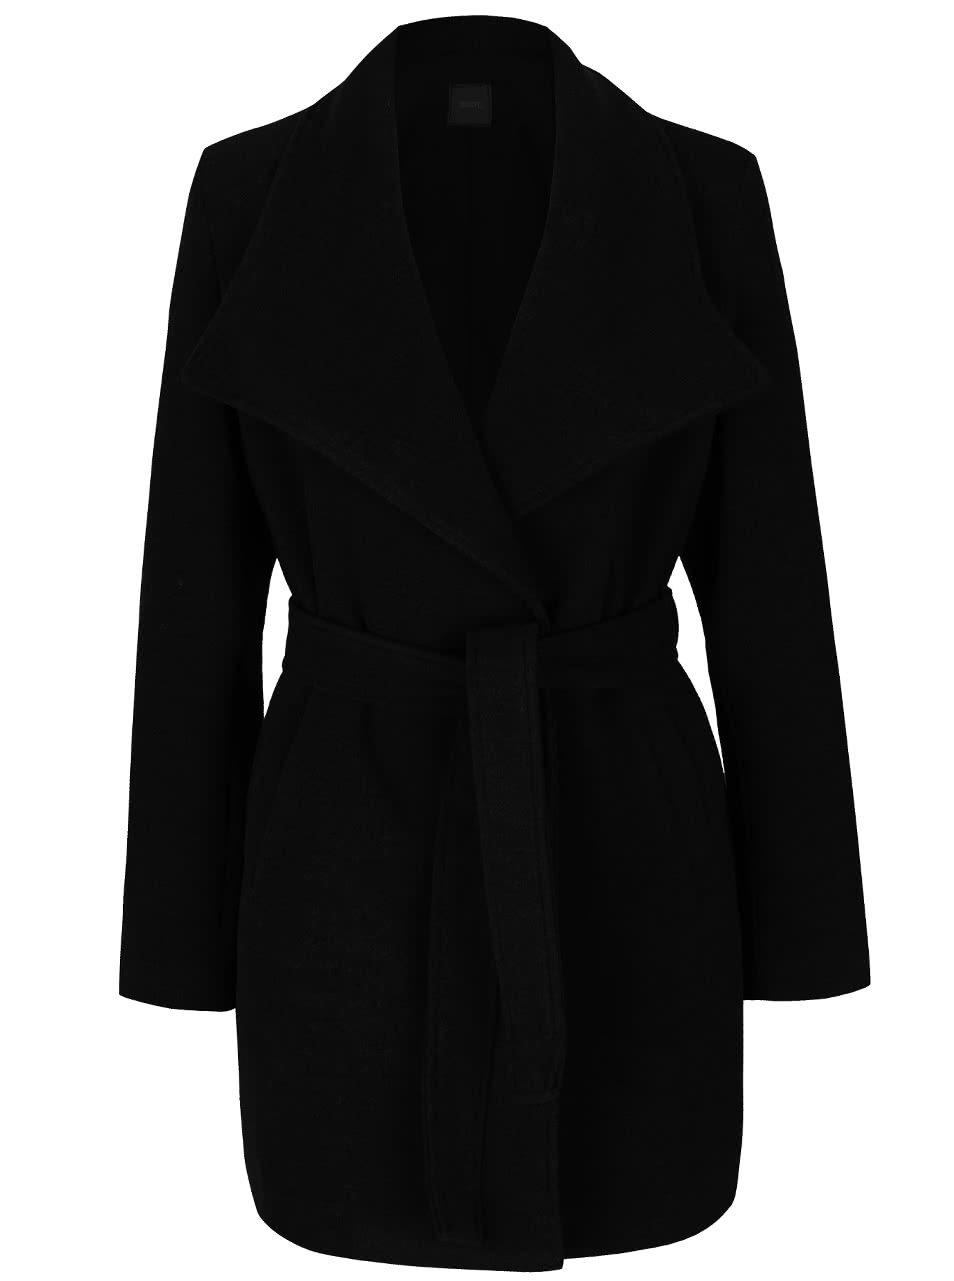 Černý kabát s páskem ZOOT